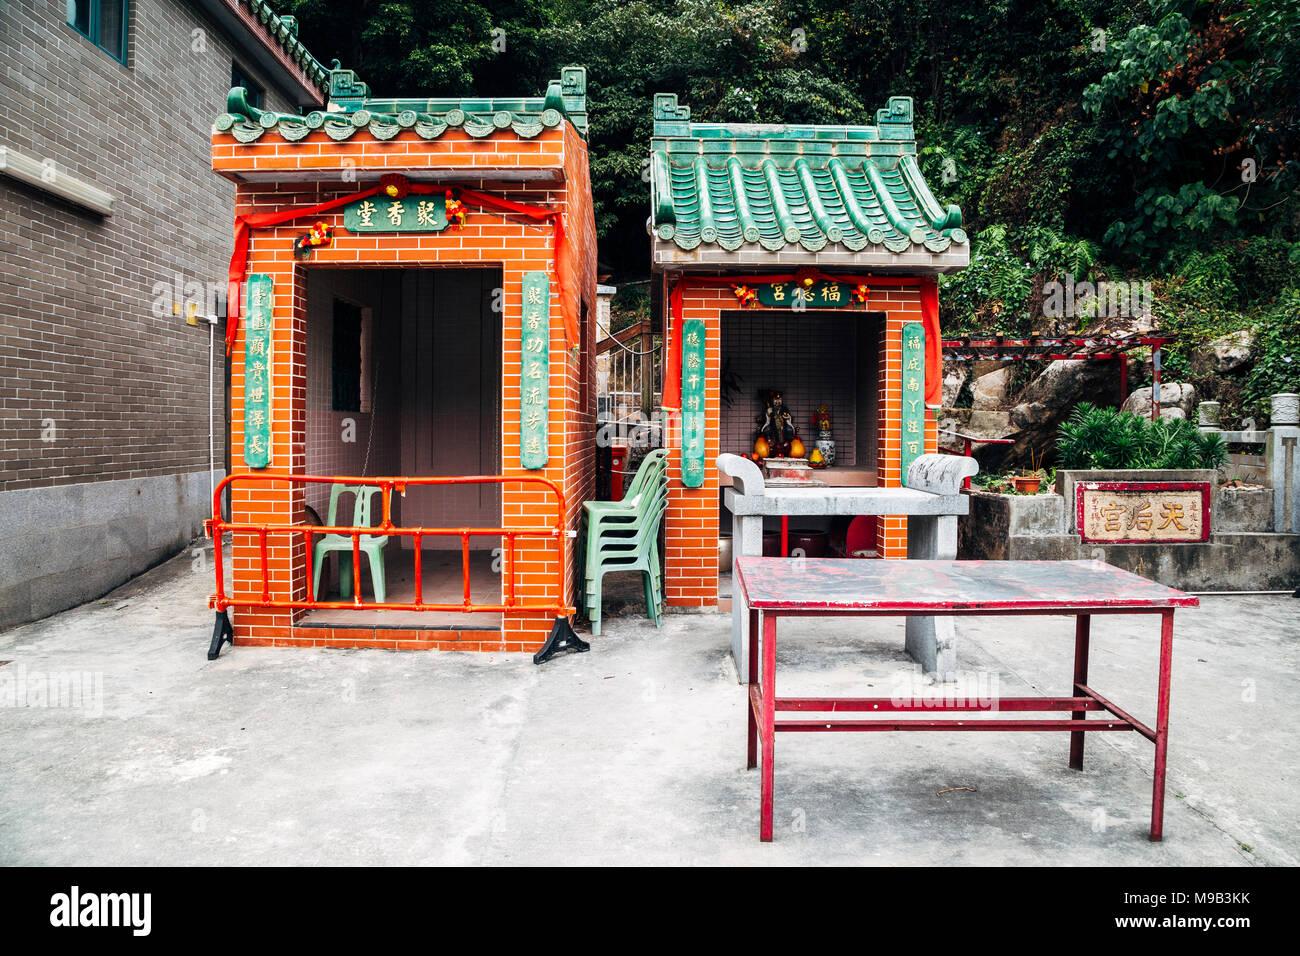 Tin Hau Temple at Lamma island sea village in Hong Kong - Stock Image